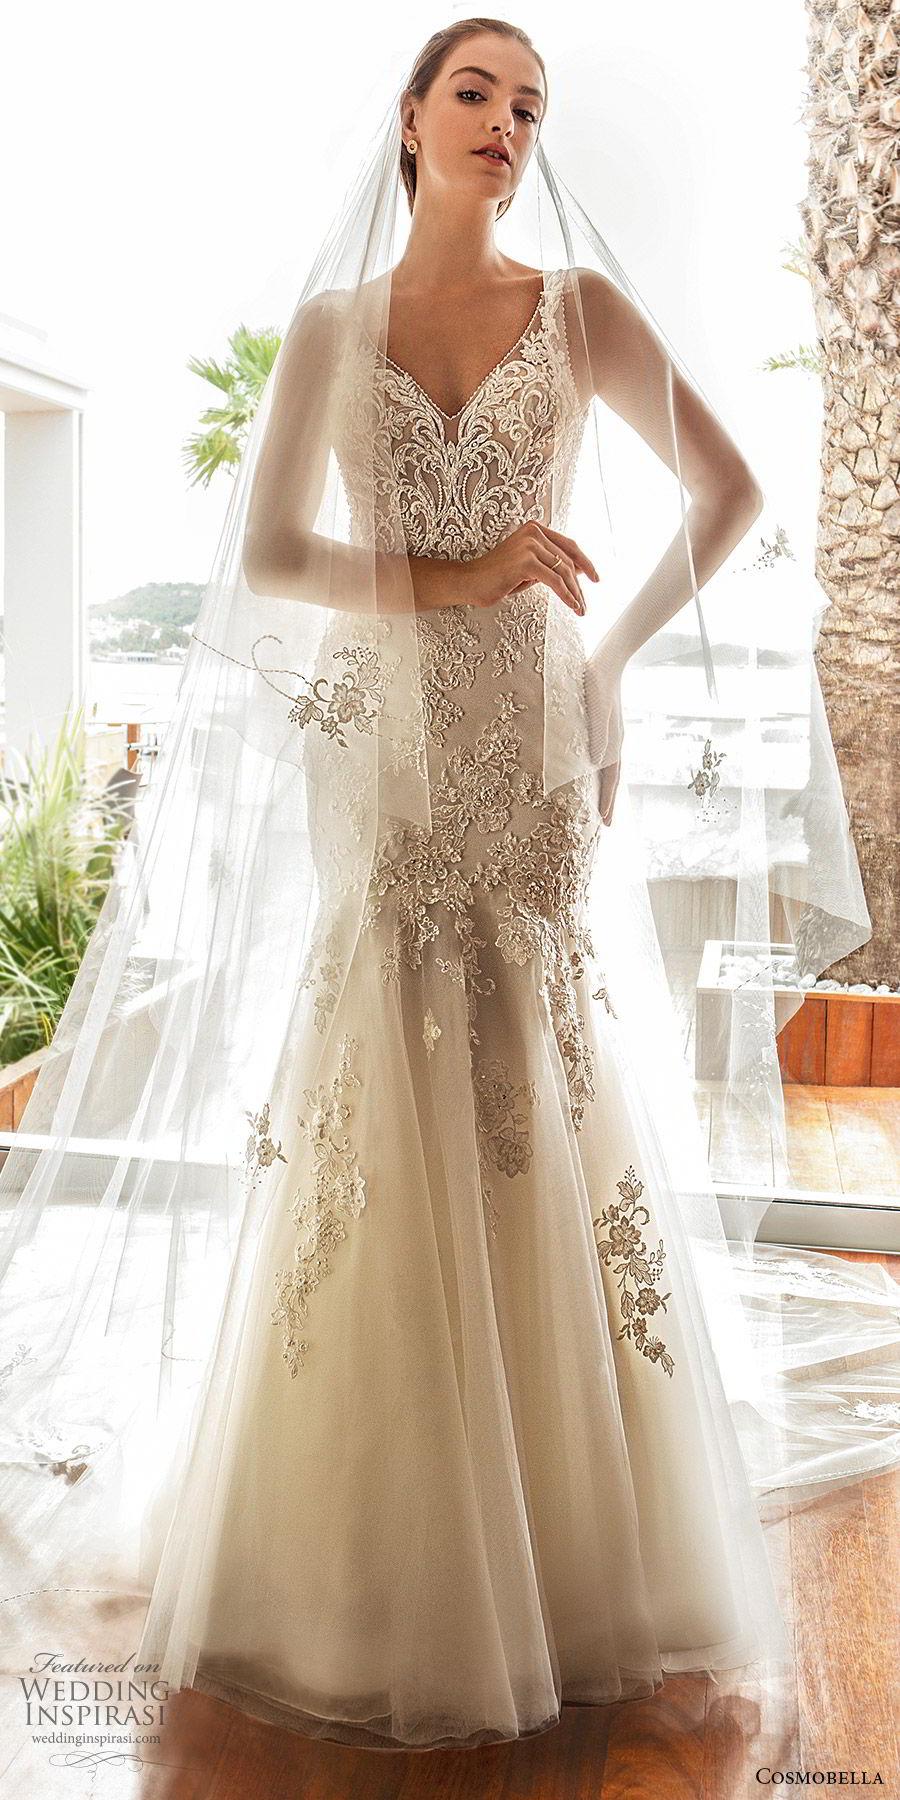 cosmobella 2020 bridal sleeveless illusion straps v neckline fully embellished fit flare mermaid wedding dress (18) glitzy glam low illusion back chapel train mv